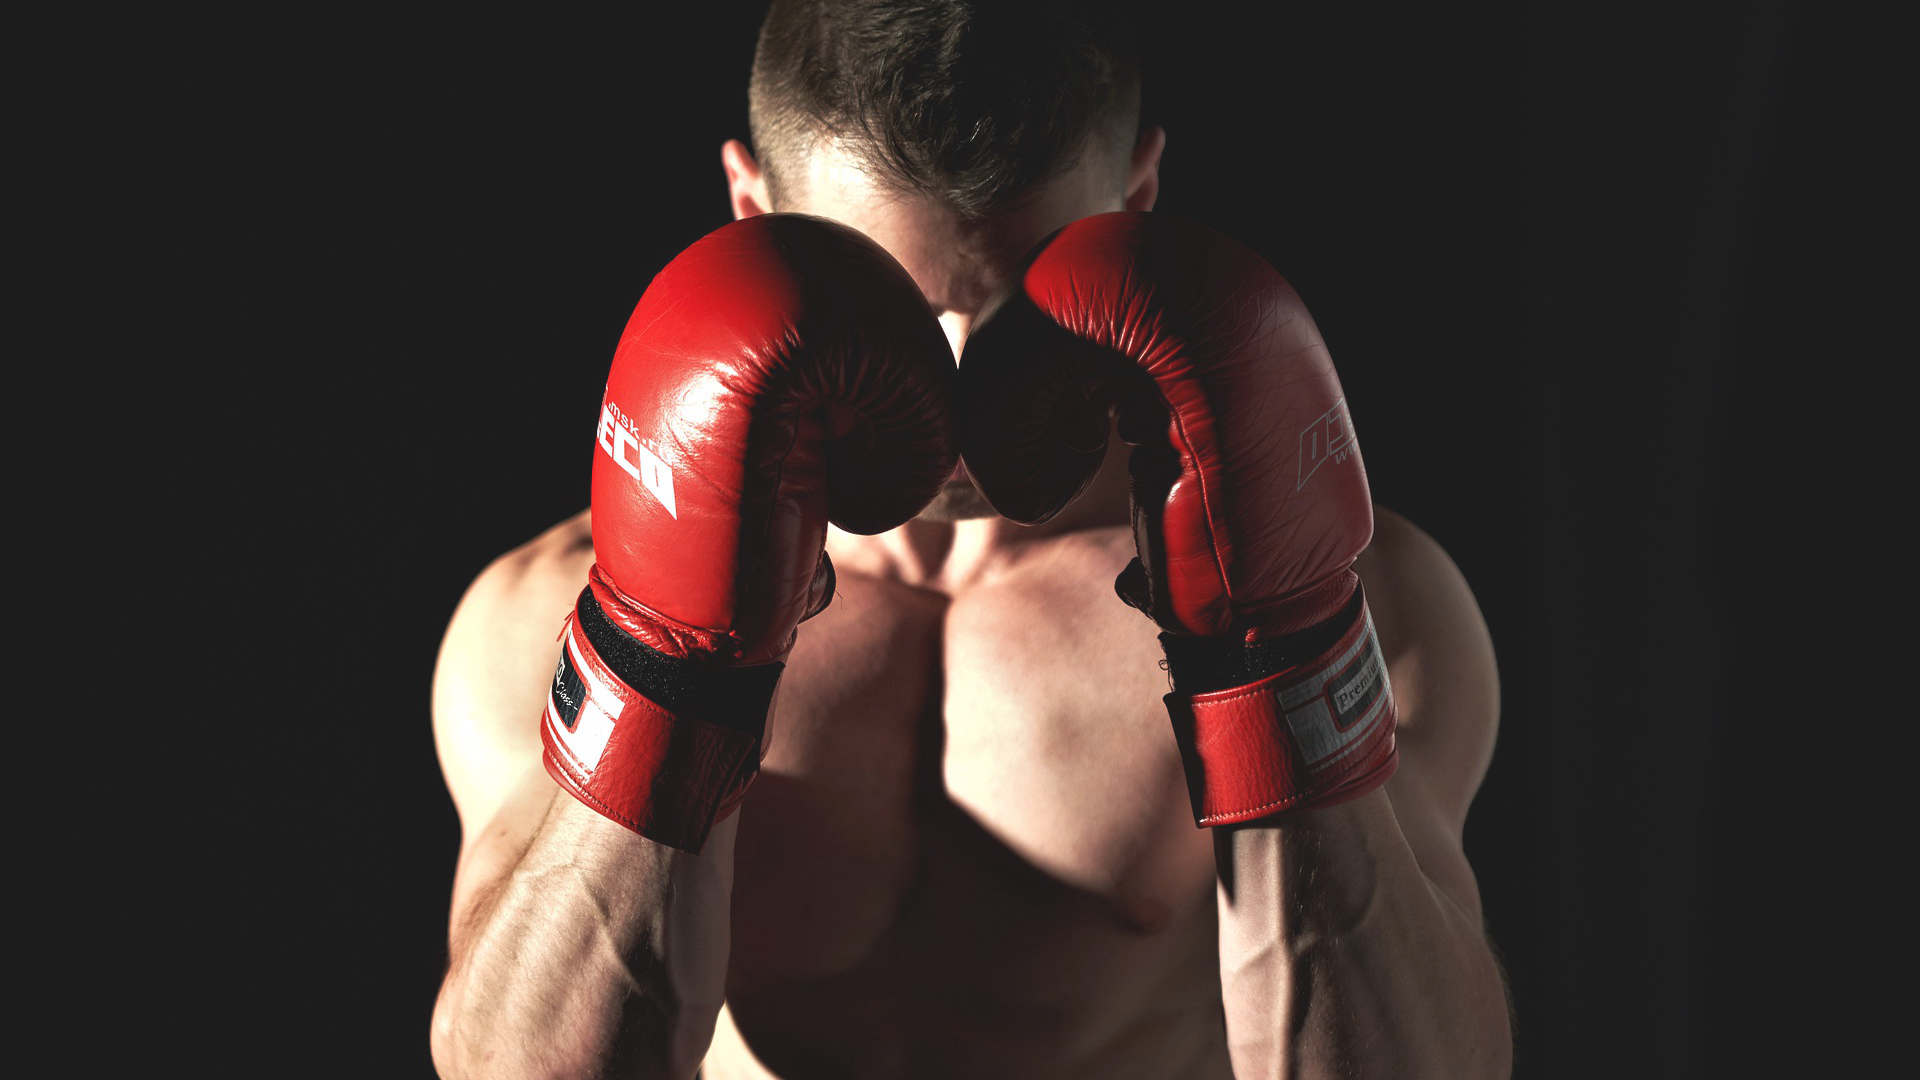 Boxen-lernen-zu-hause-boxing-arts.com